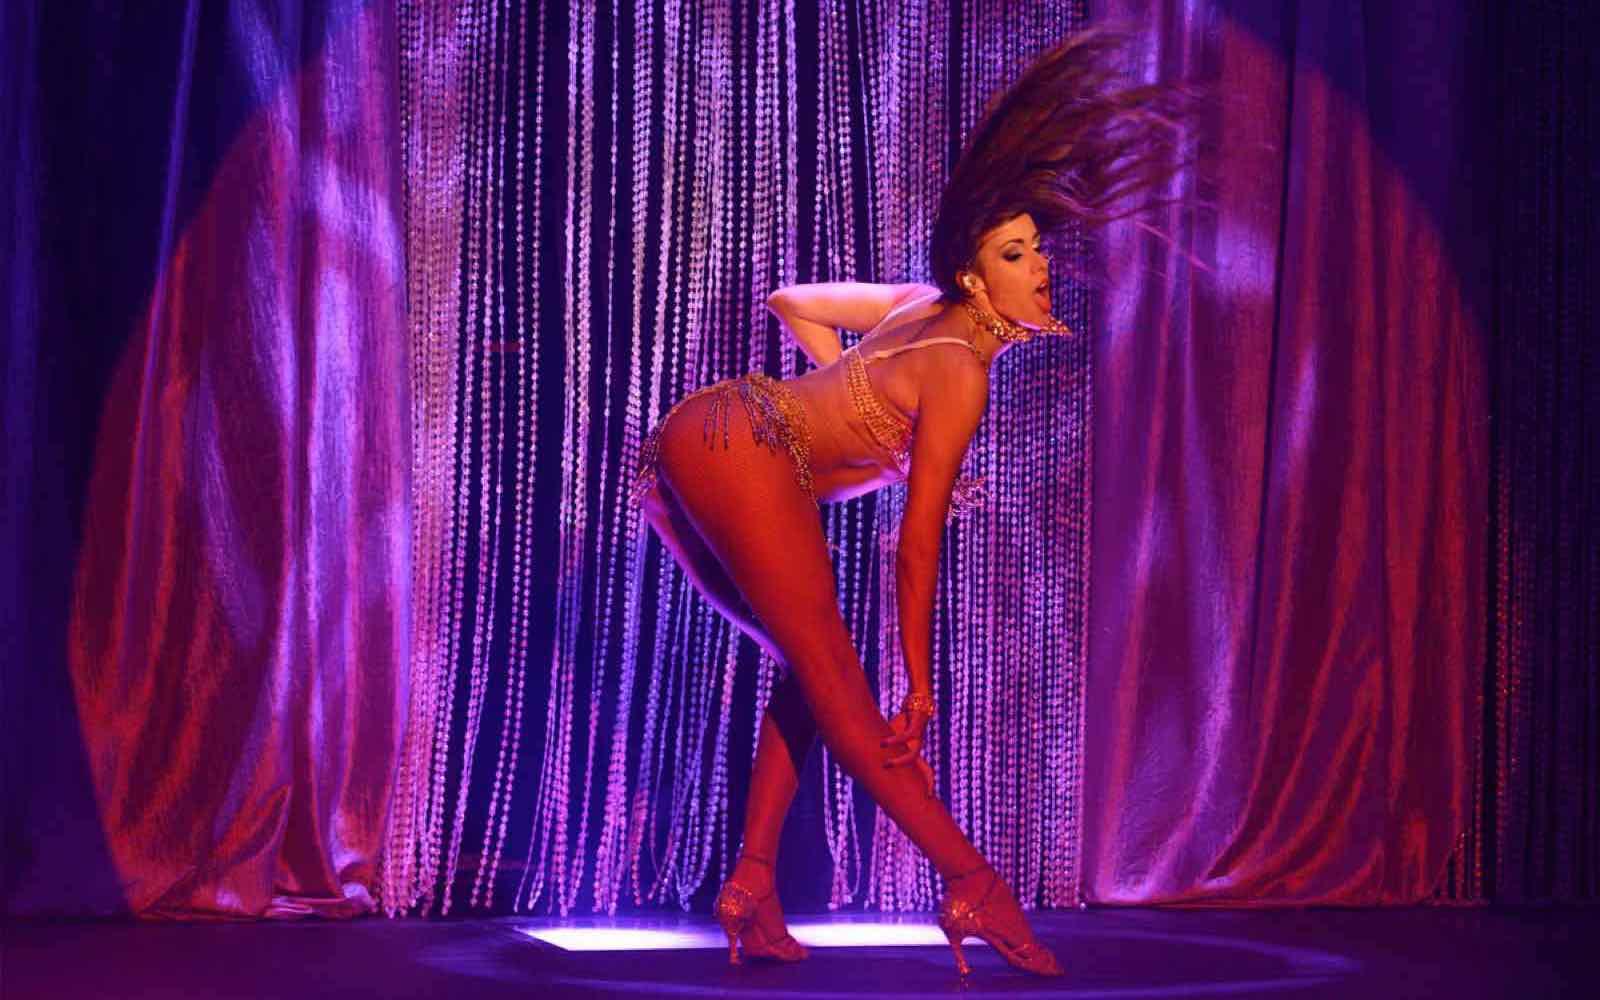 The Fantasy Show in Las Vegas